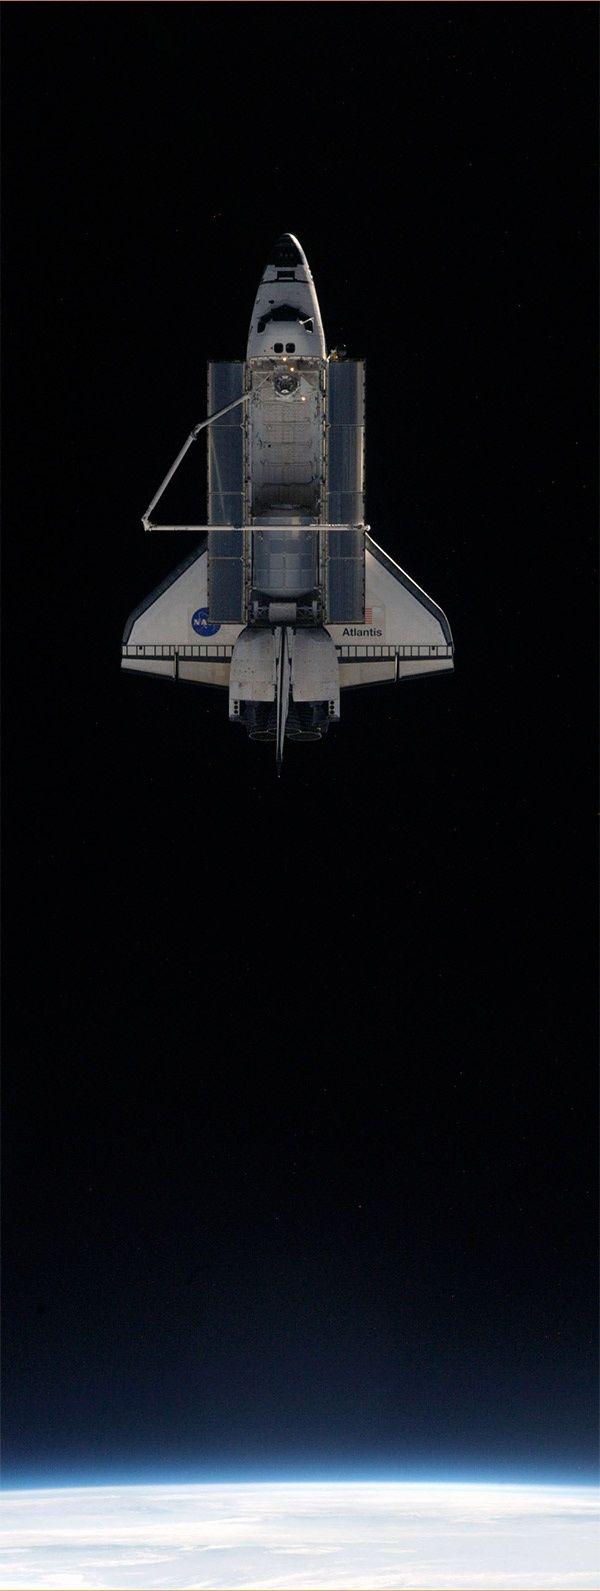 Atlantis in the orbit, cargo bay open. Space flight